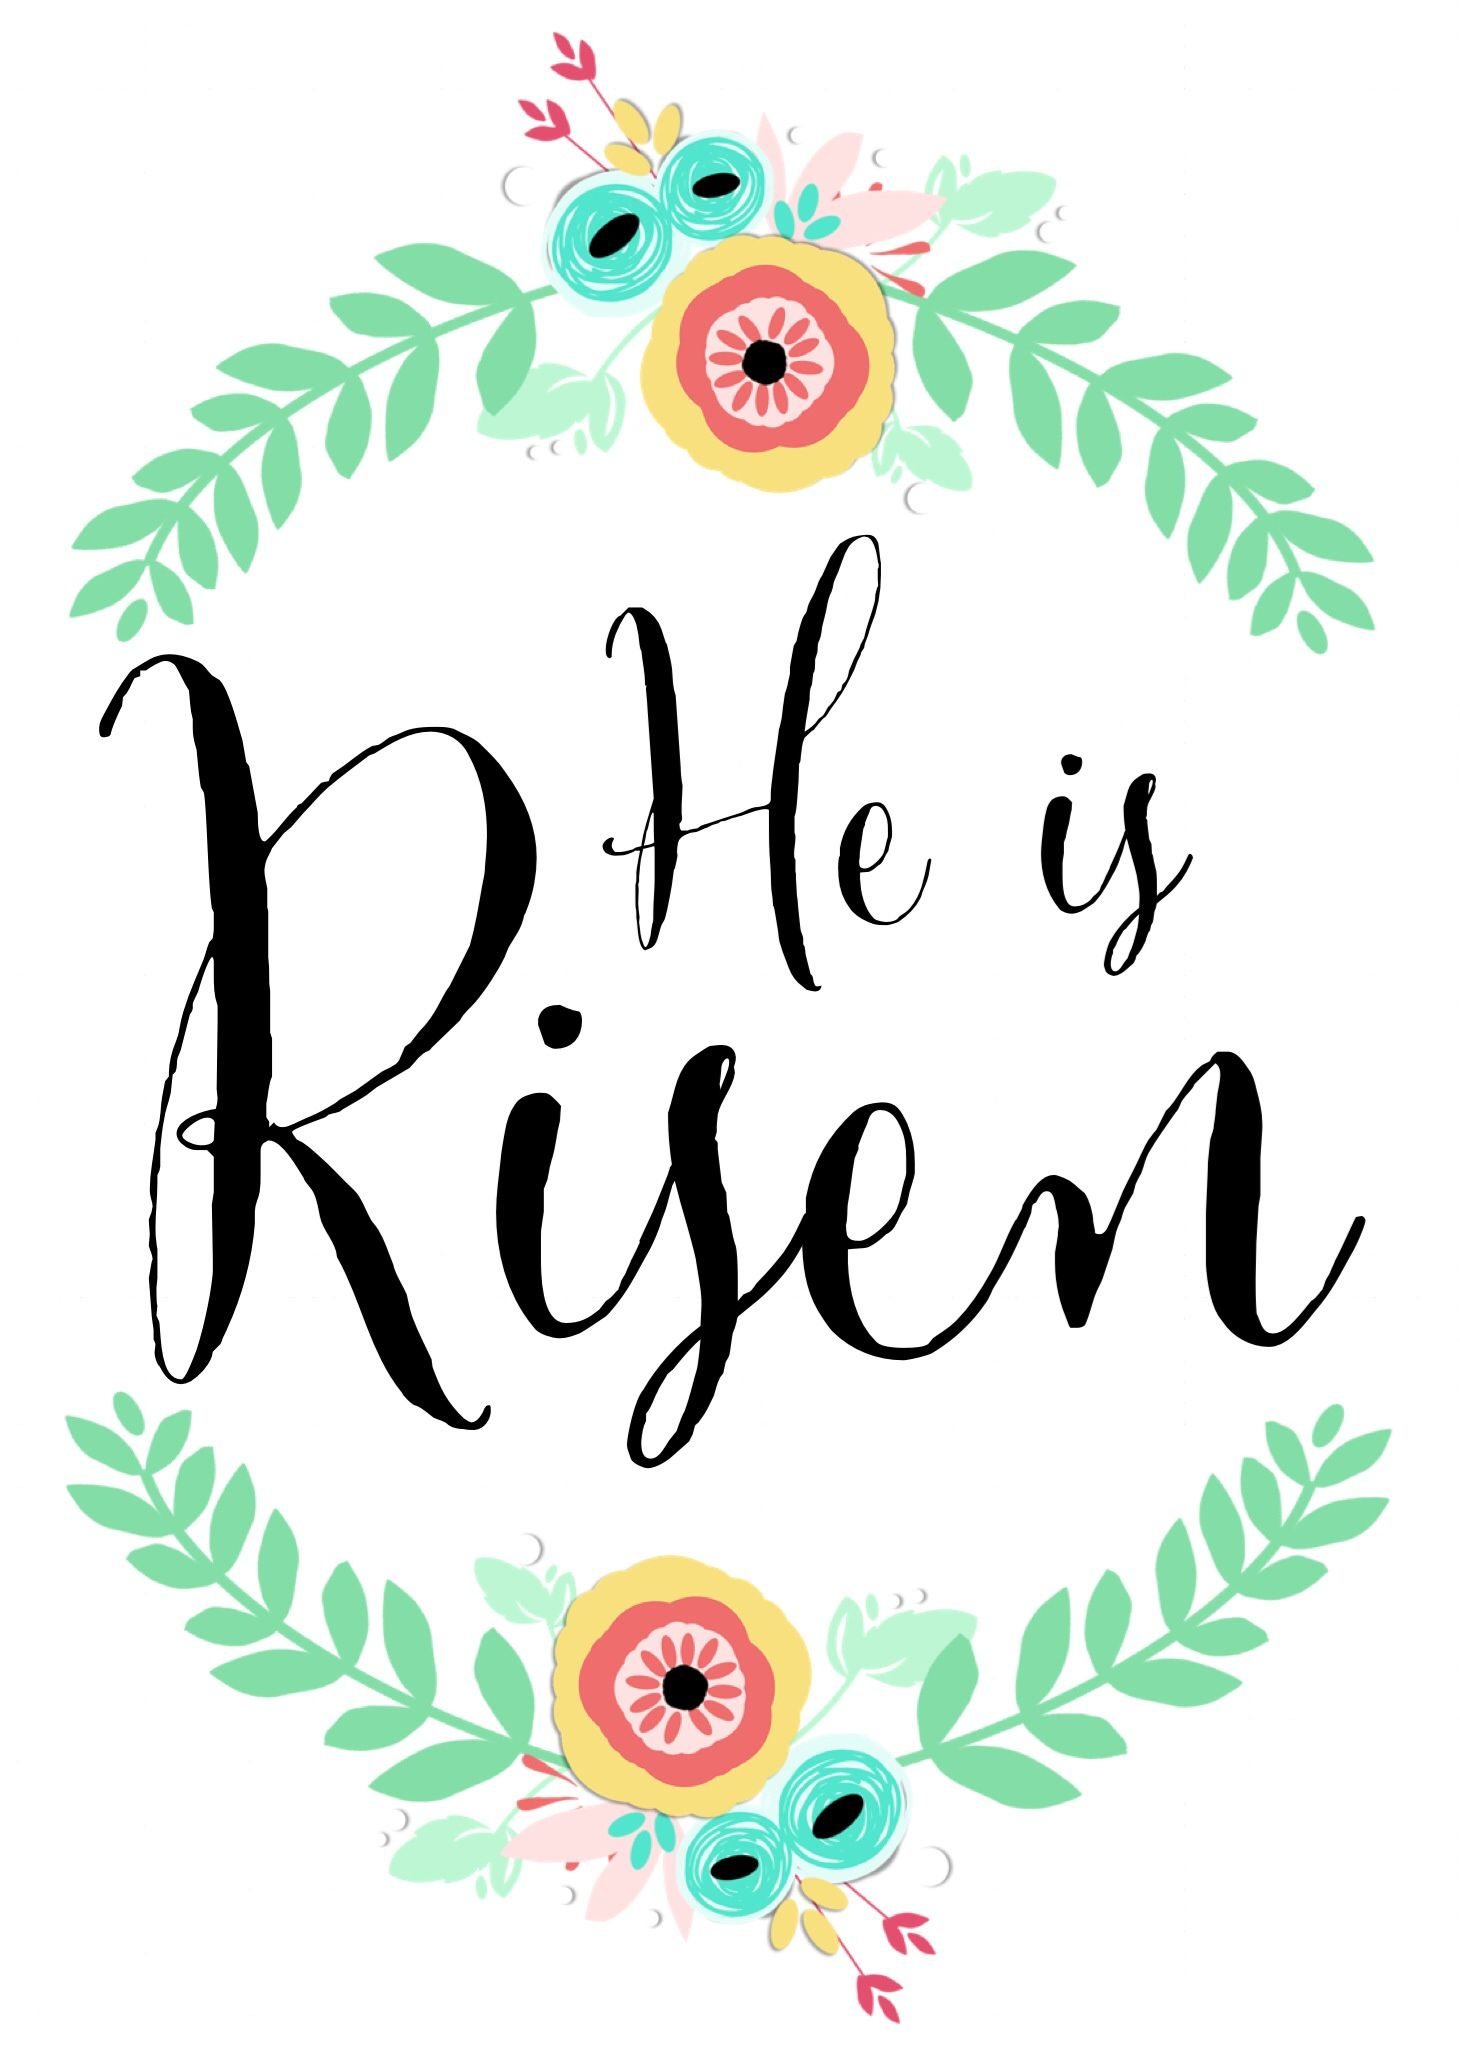 hight resolution of jesus is risen he is risen sign risen christ he has risen